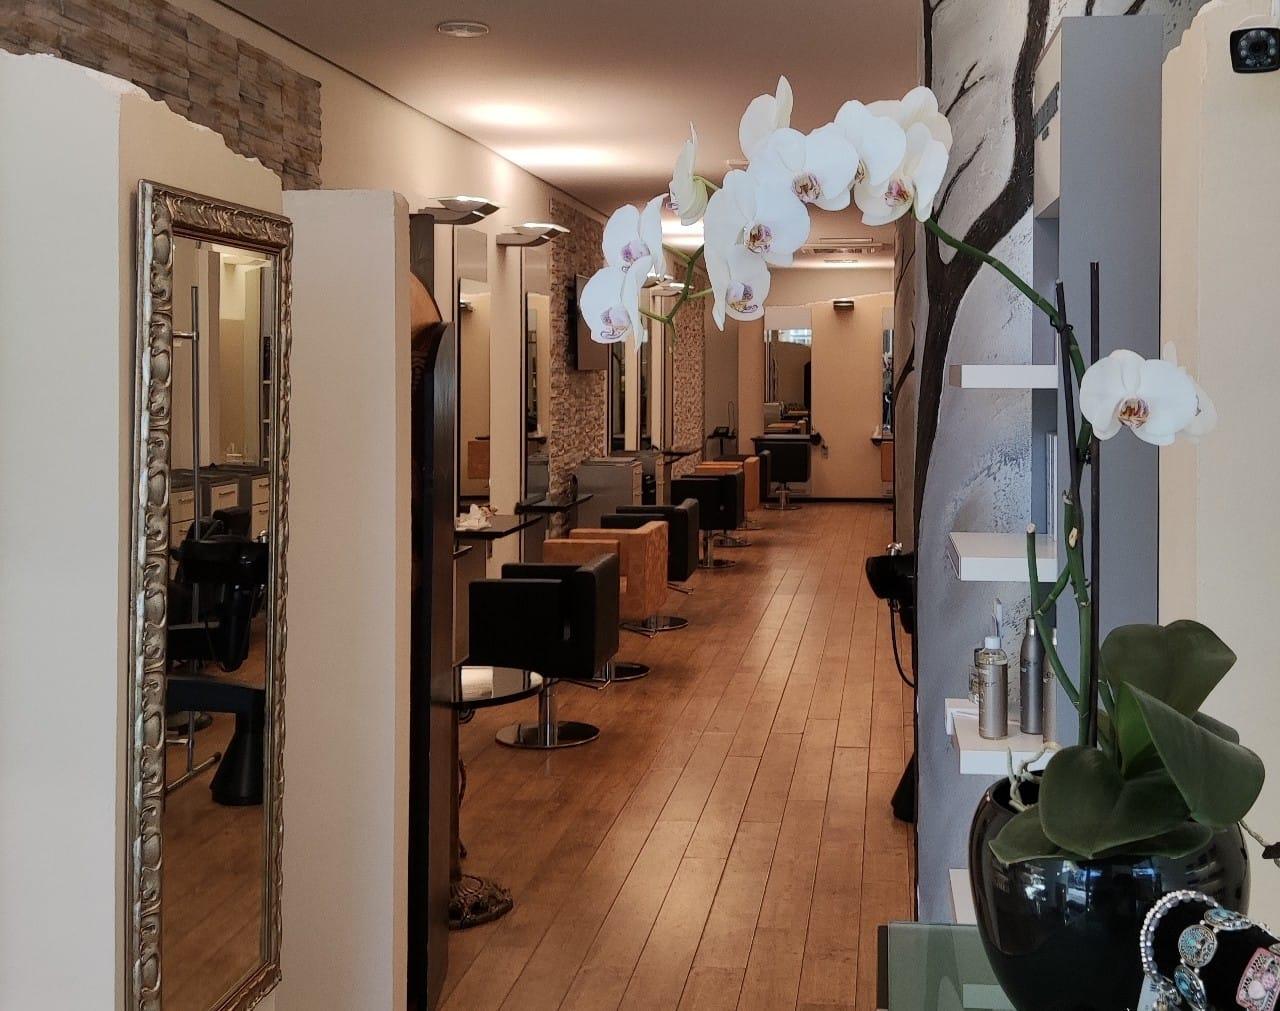 Einblick in Friseursalon Sylvia Schacht in Poppenbüttel